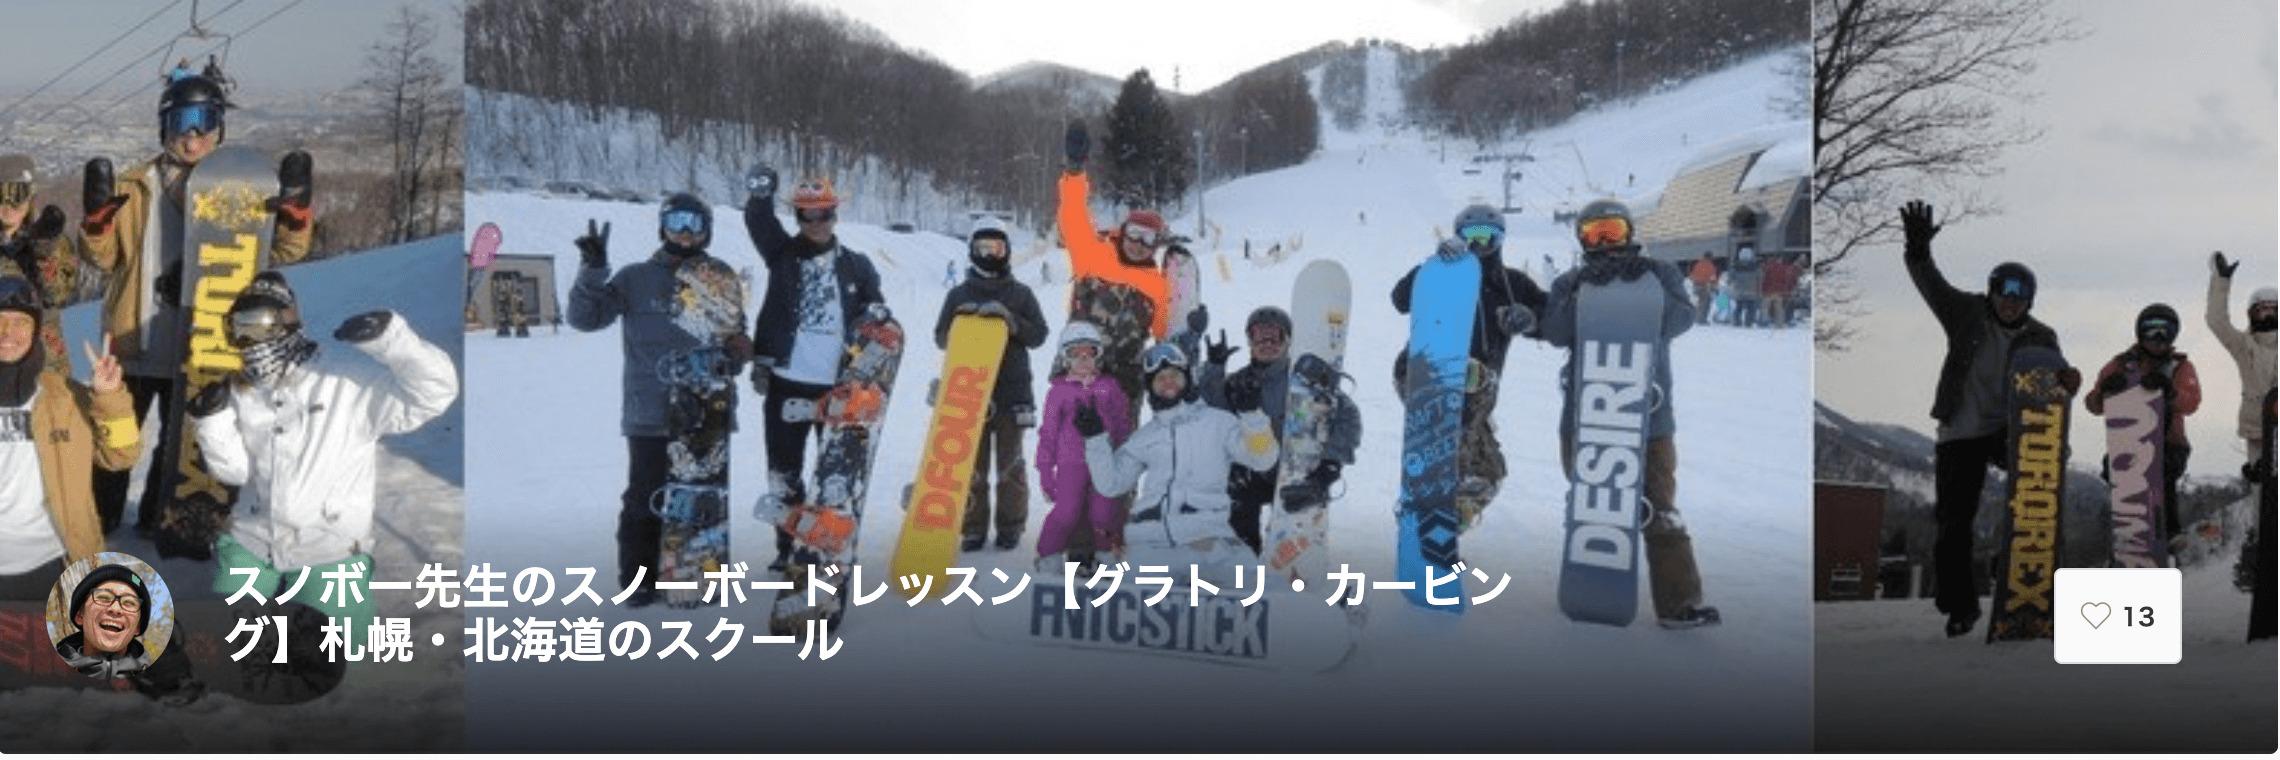 youtube_snowboard_lesson